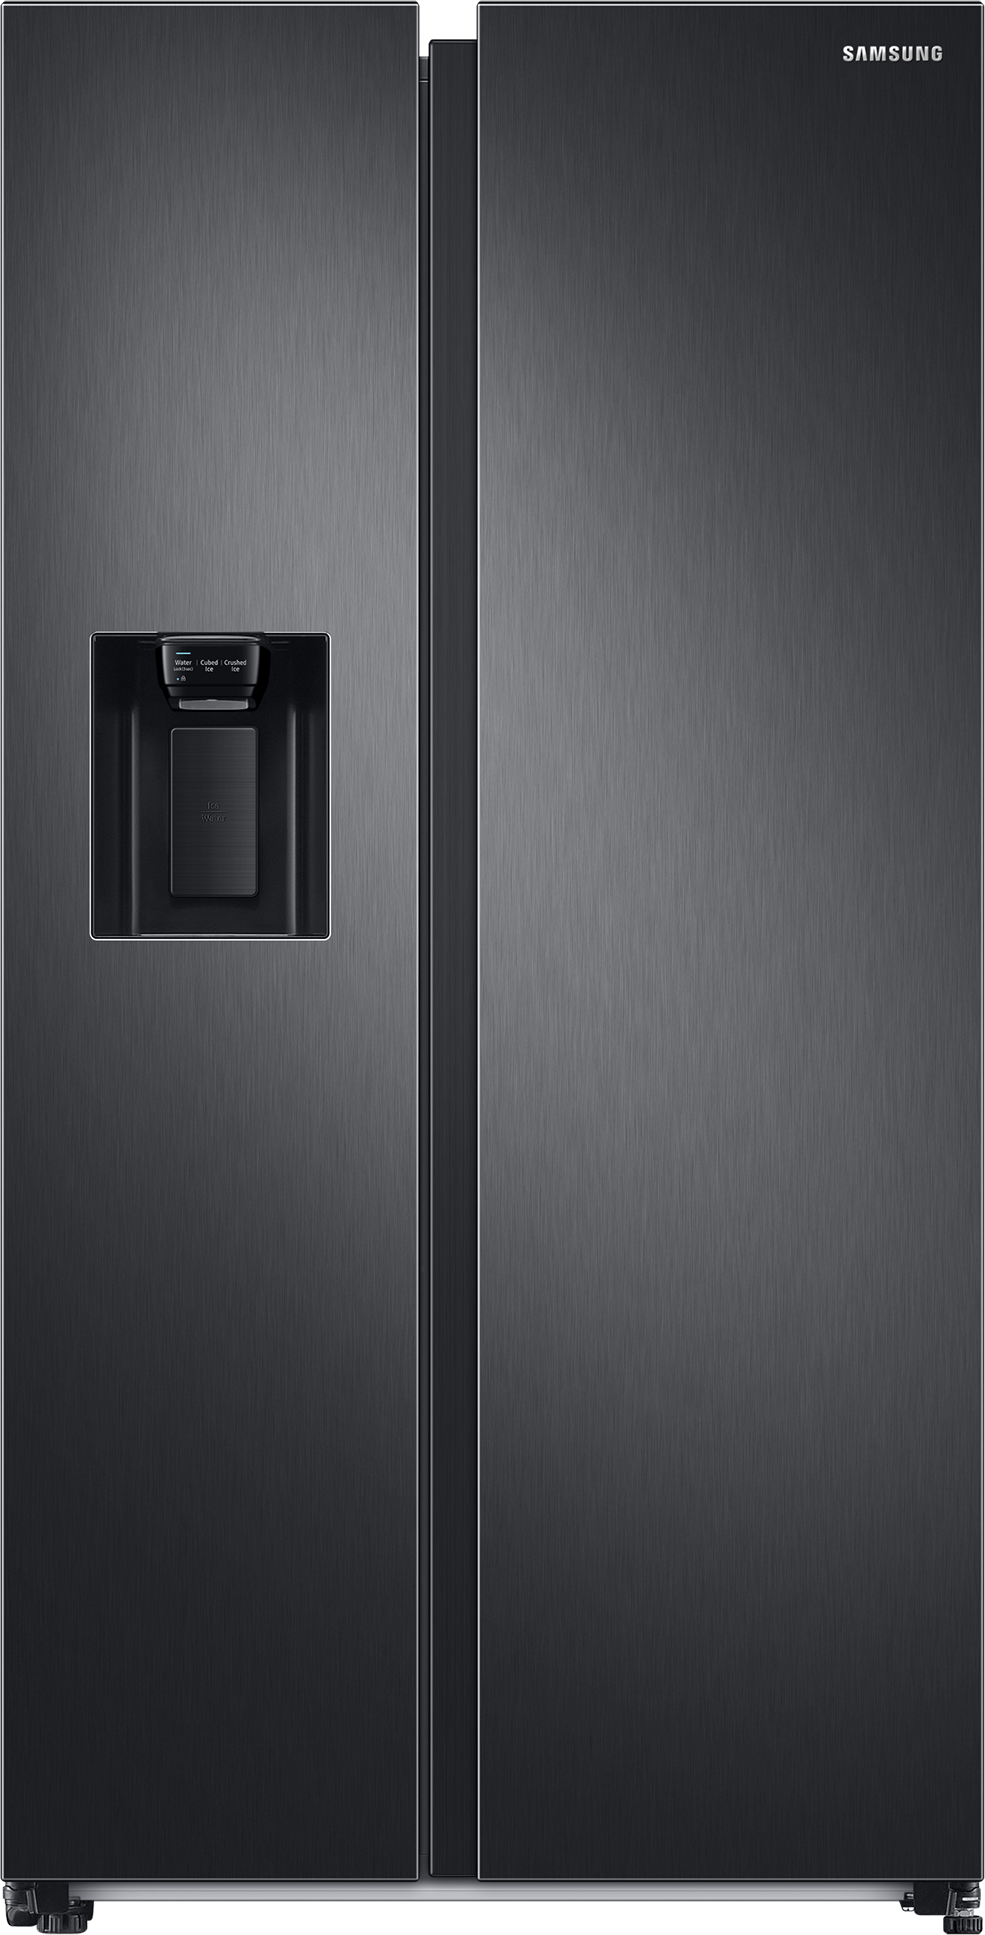 SAMSUNG RS68A8840B1 - Réfrigérateur américain